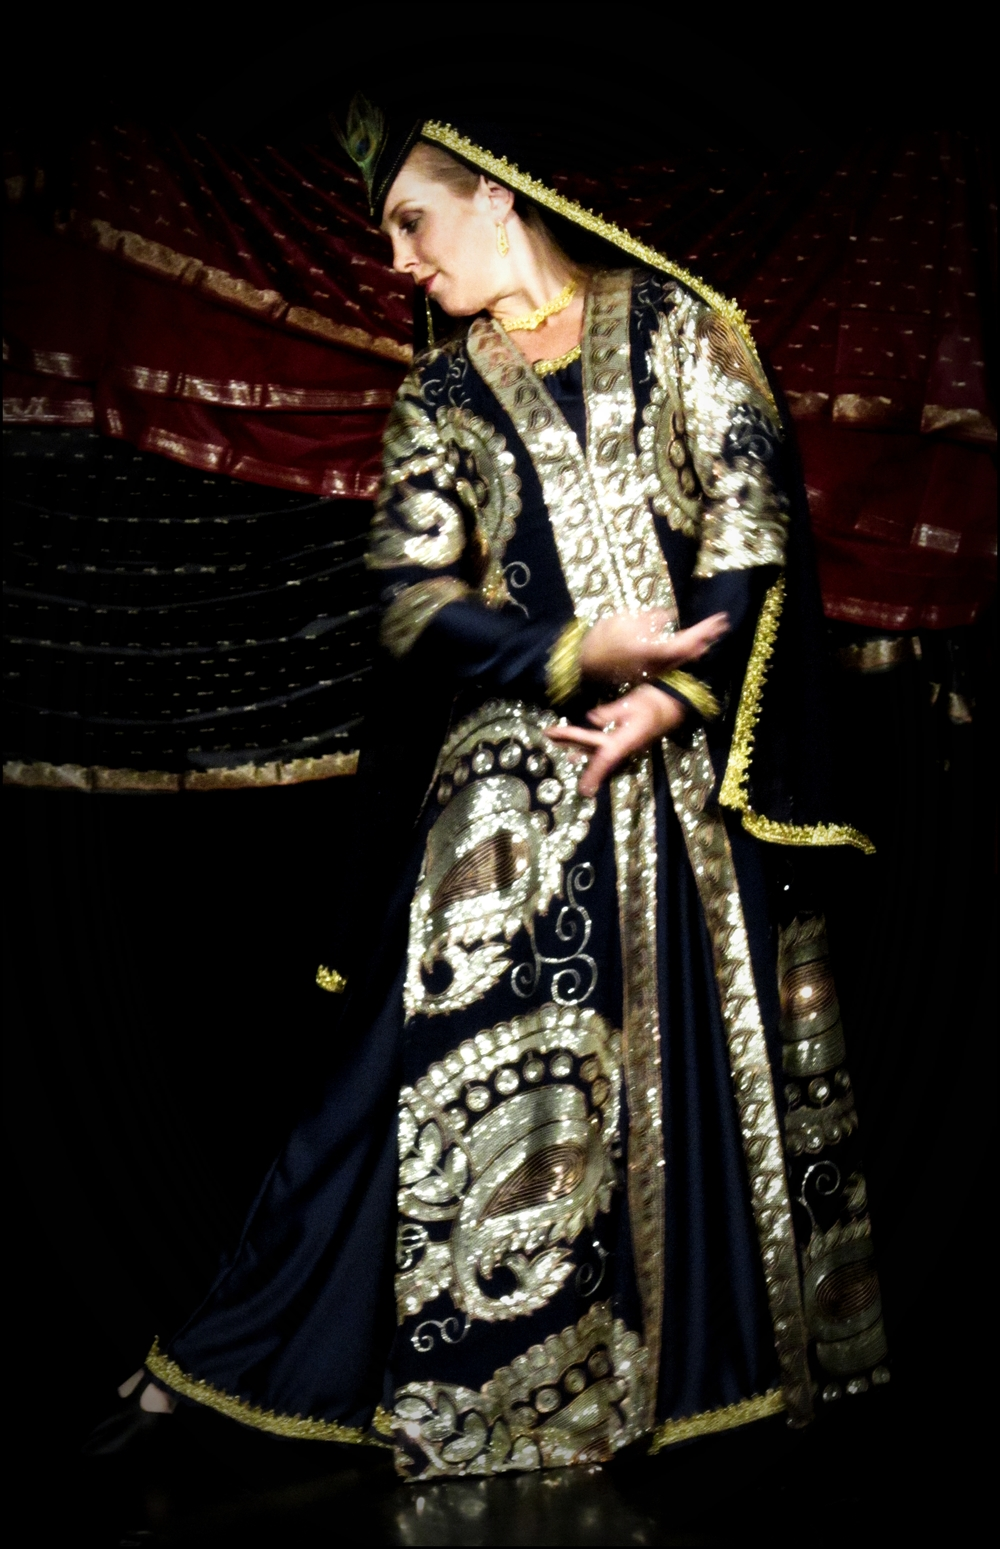 Maria Oriental - Persian Classical Dance at 1001 Dance. Uppsala, May 2013. Photo: Beryl Granström